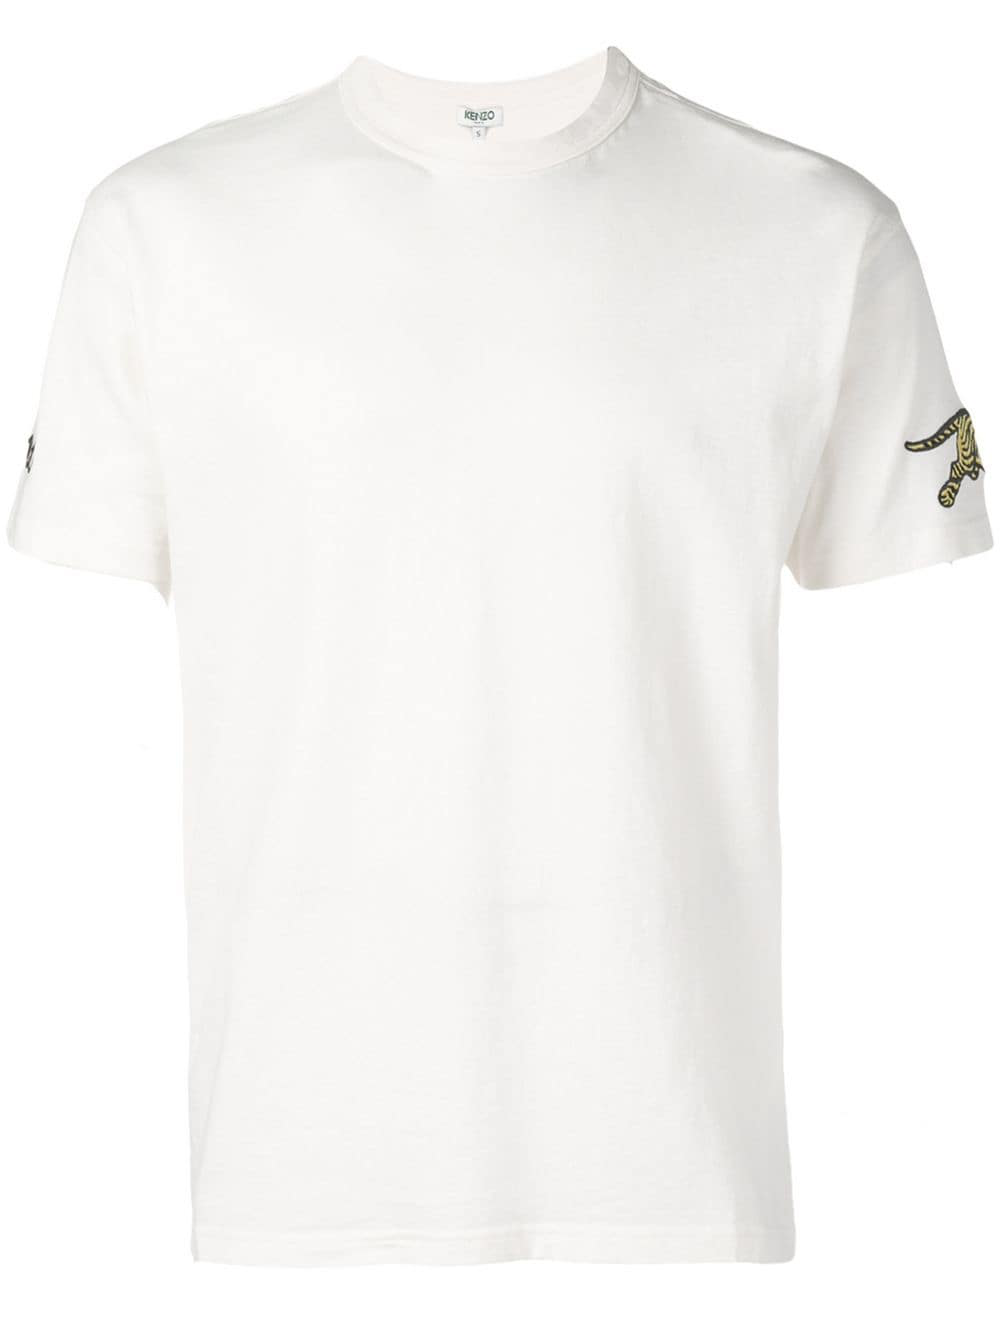 76d6b70dcd3 Kenzo Tiger Patch T-Shirt - Neutrals In 03 Nude